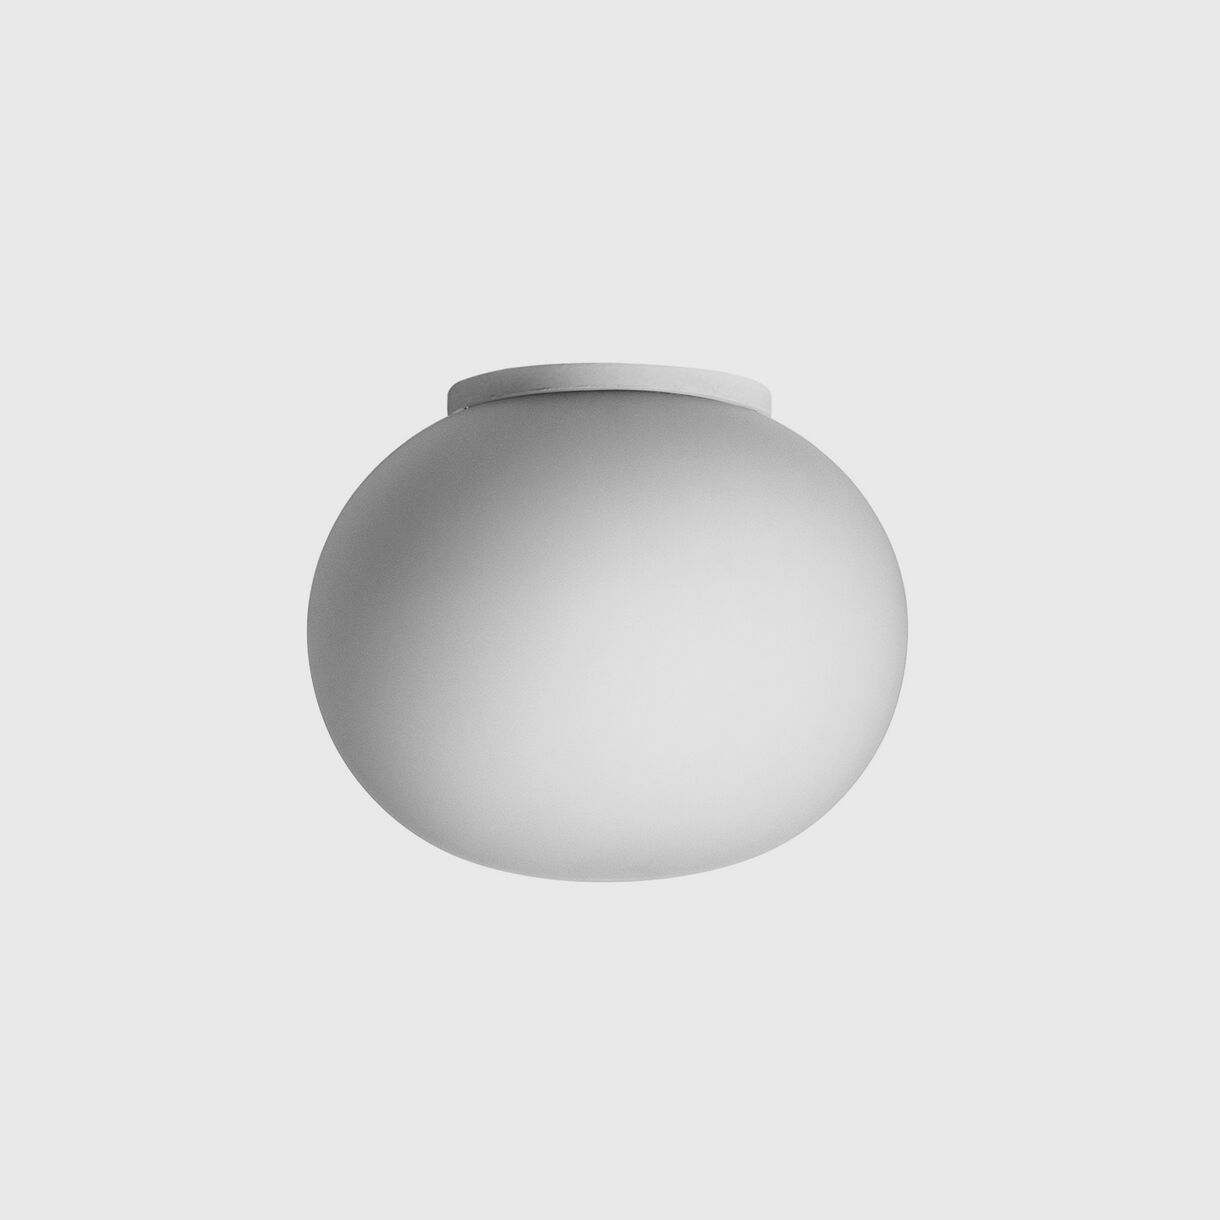 Mini Glo-Ball, Ceiling & Wall, Off